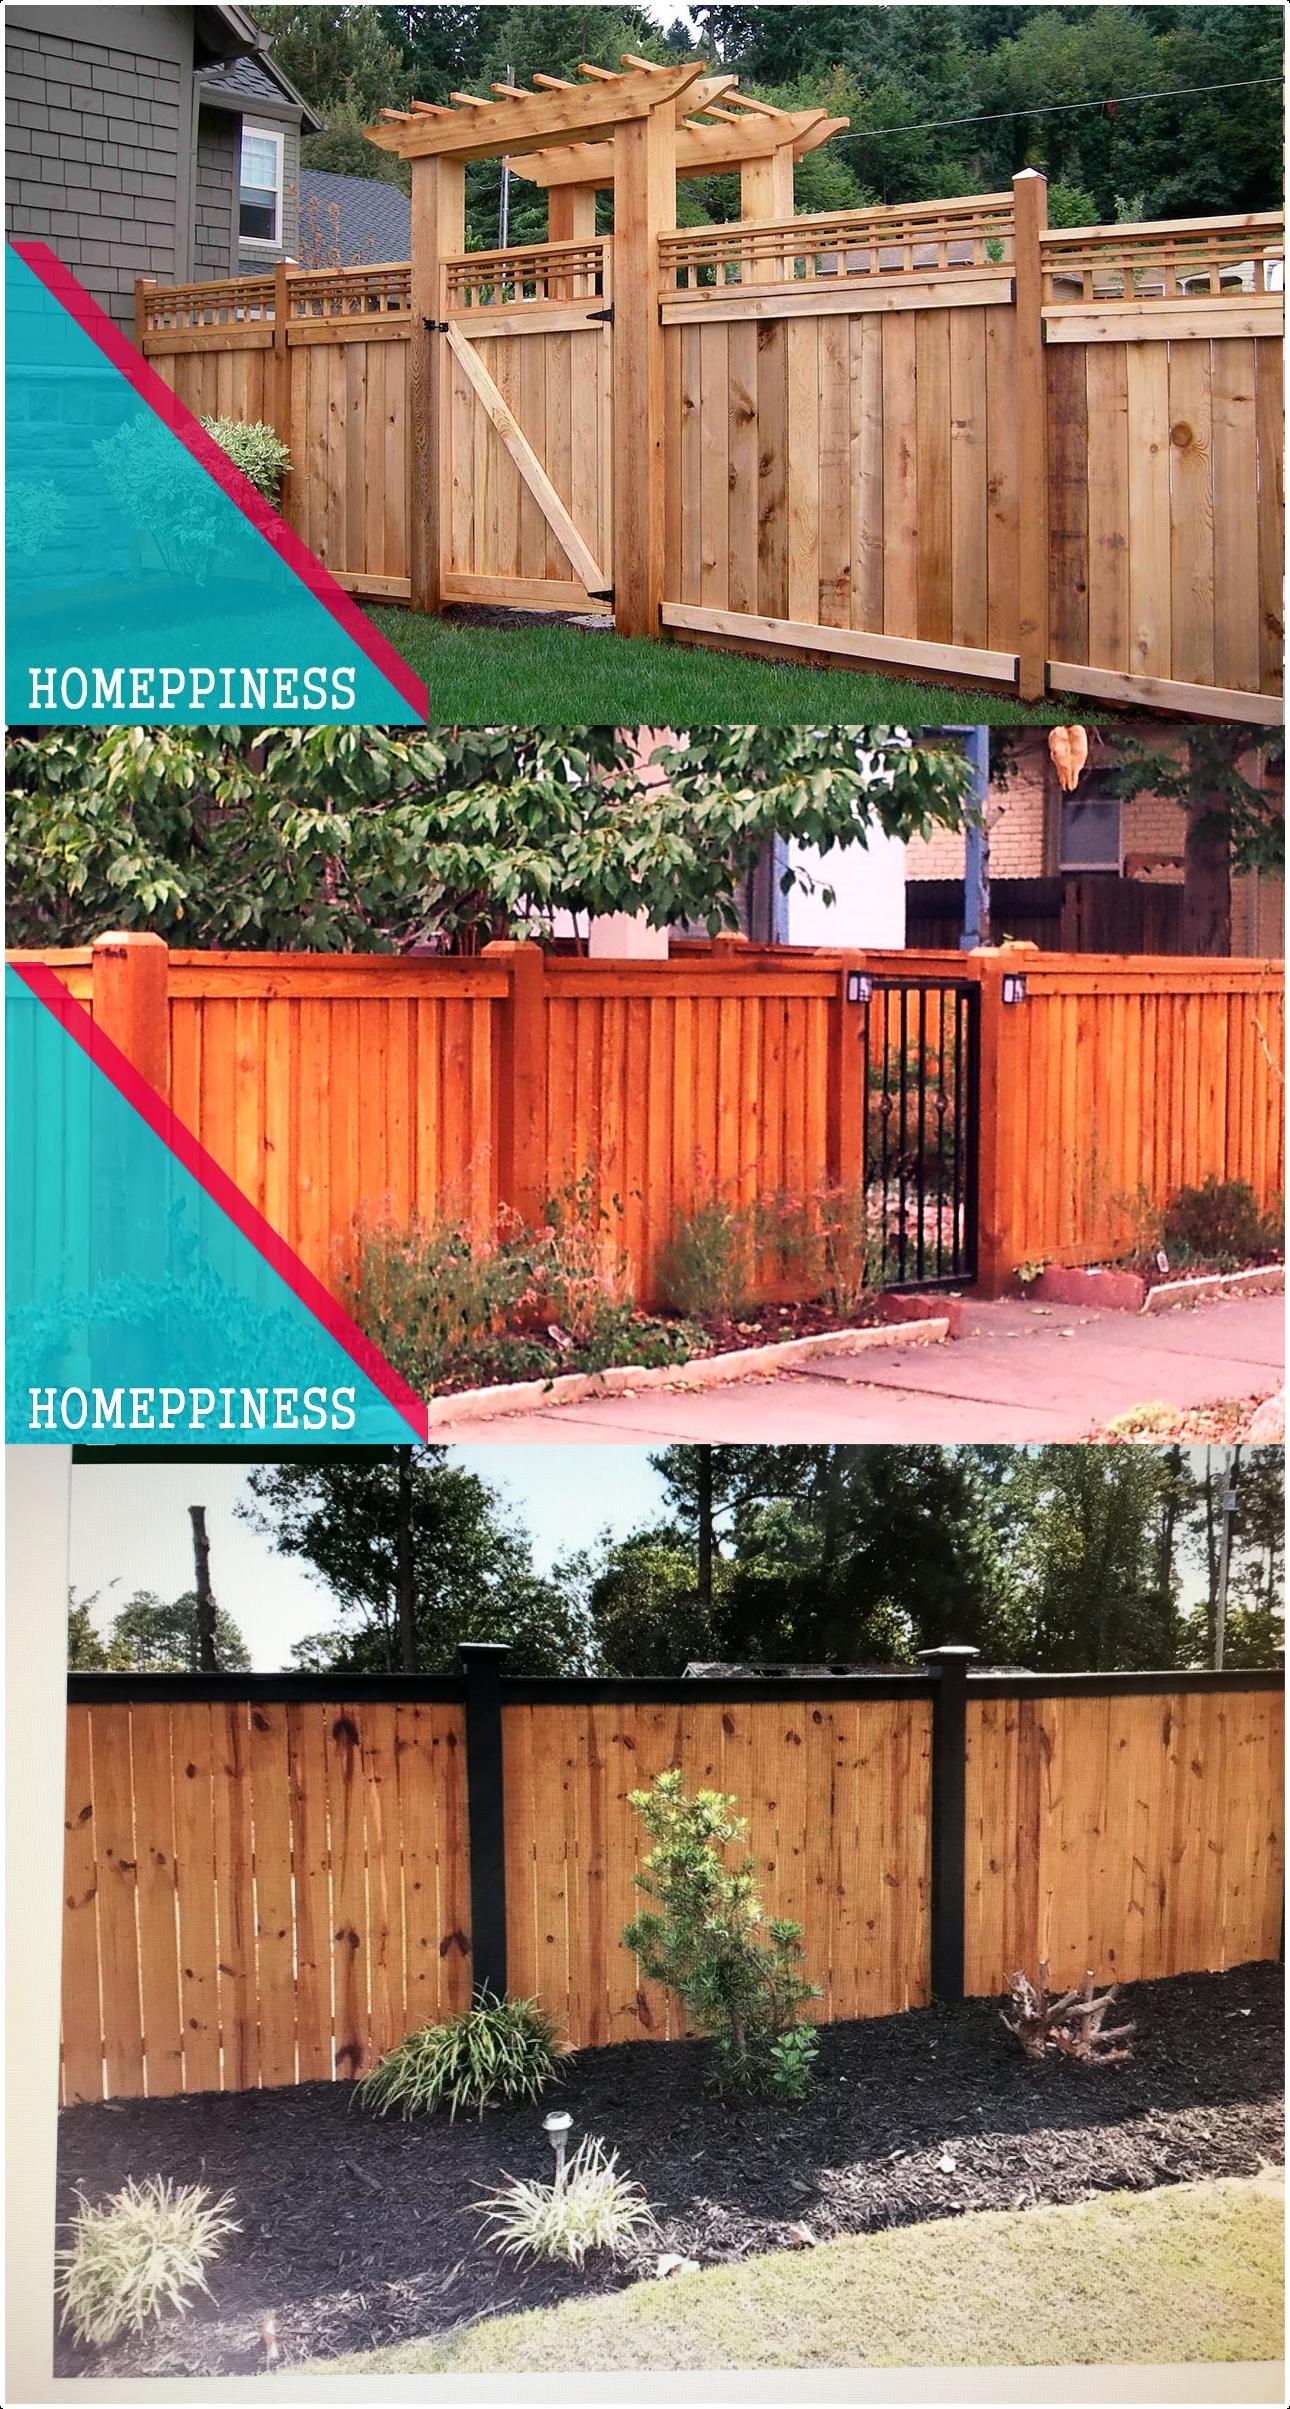 11.SIMPHOME.COM Cheap Wooden Fence pin Stephanie Allison On Backyard